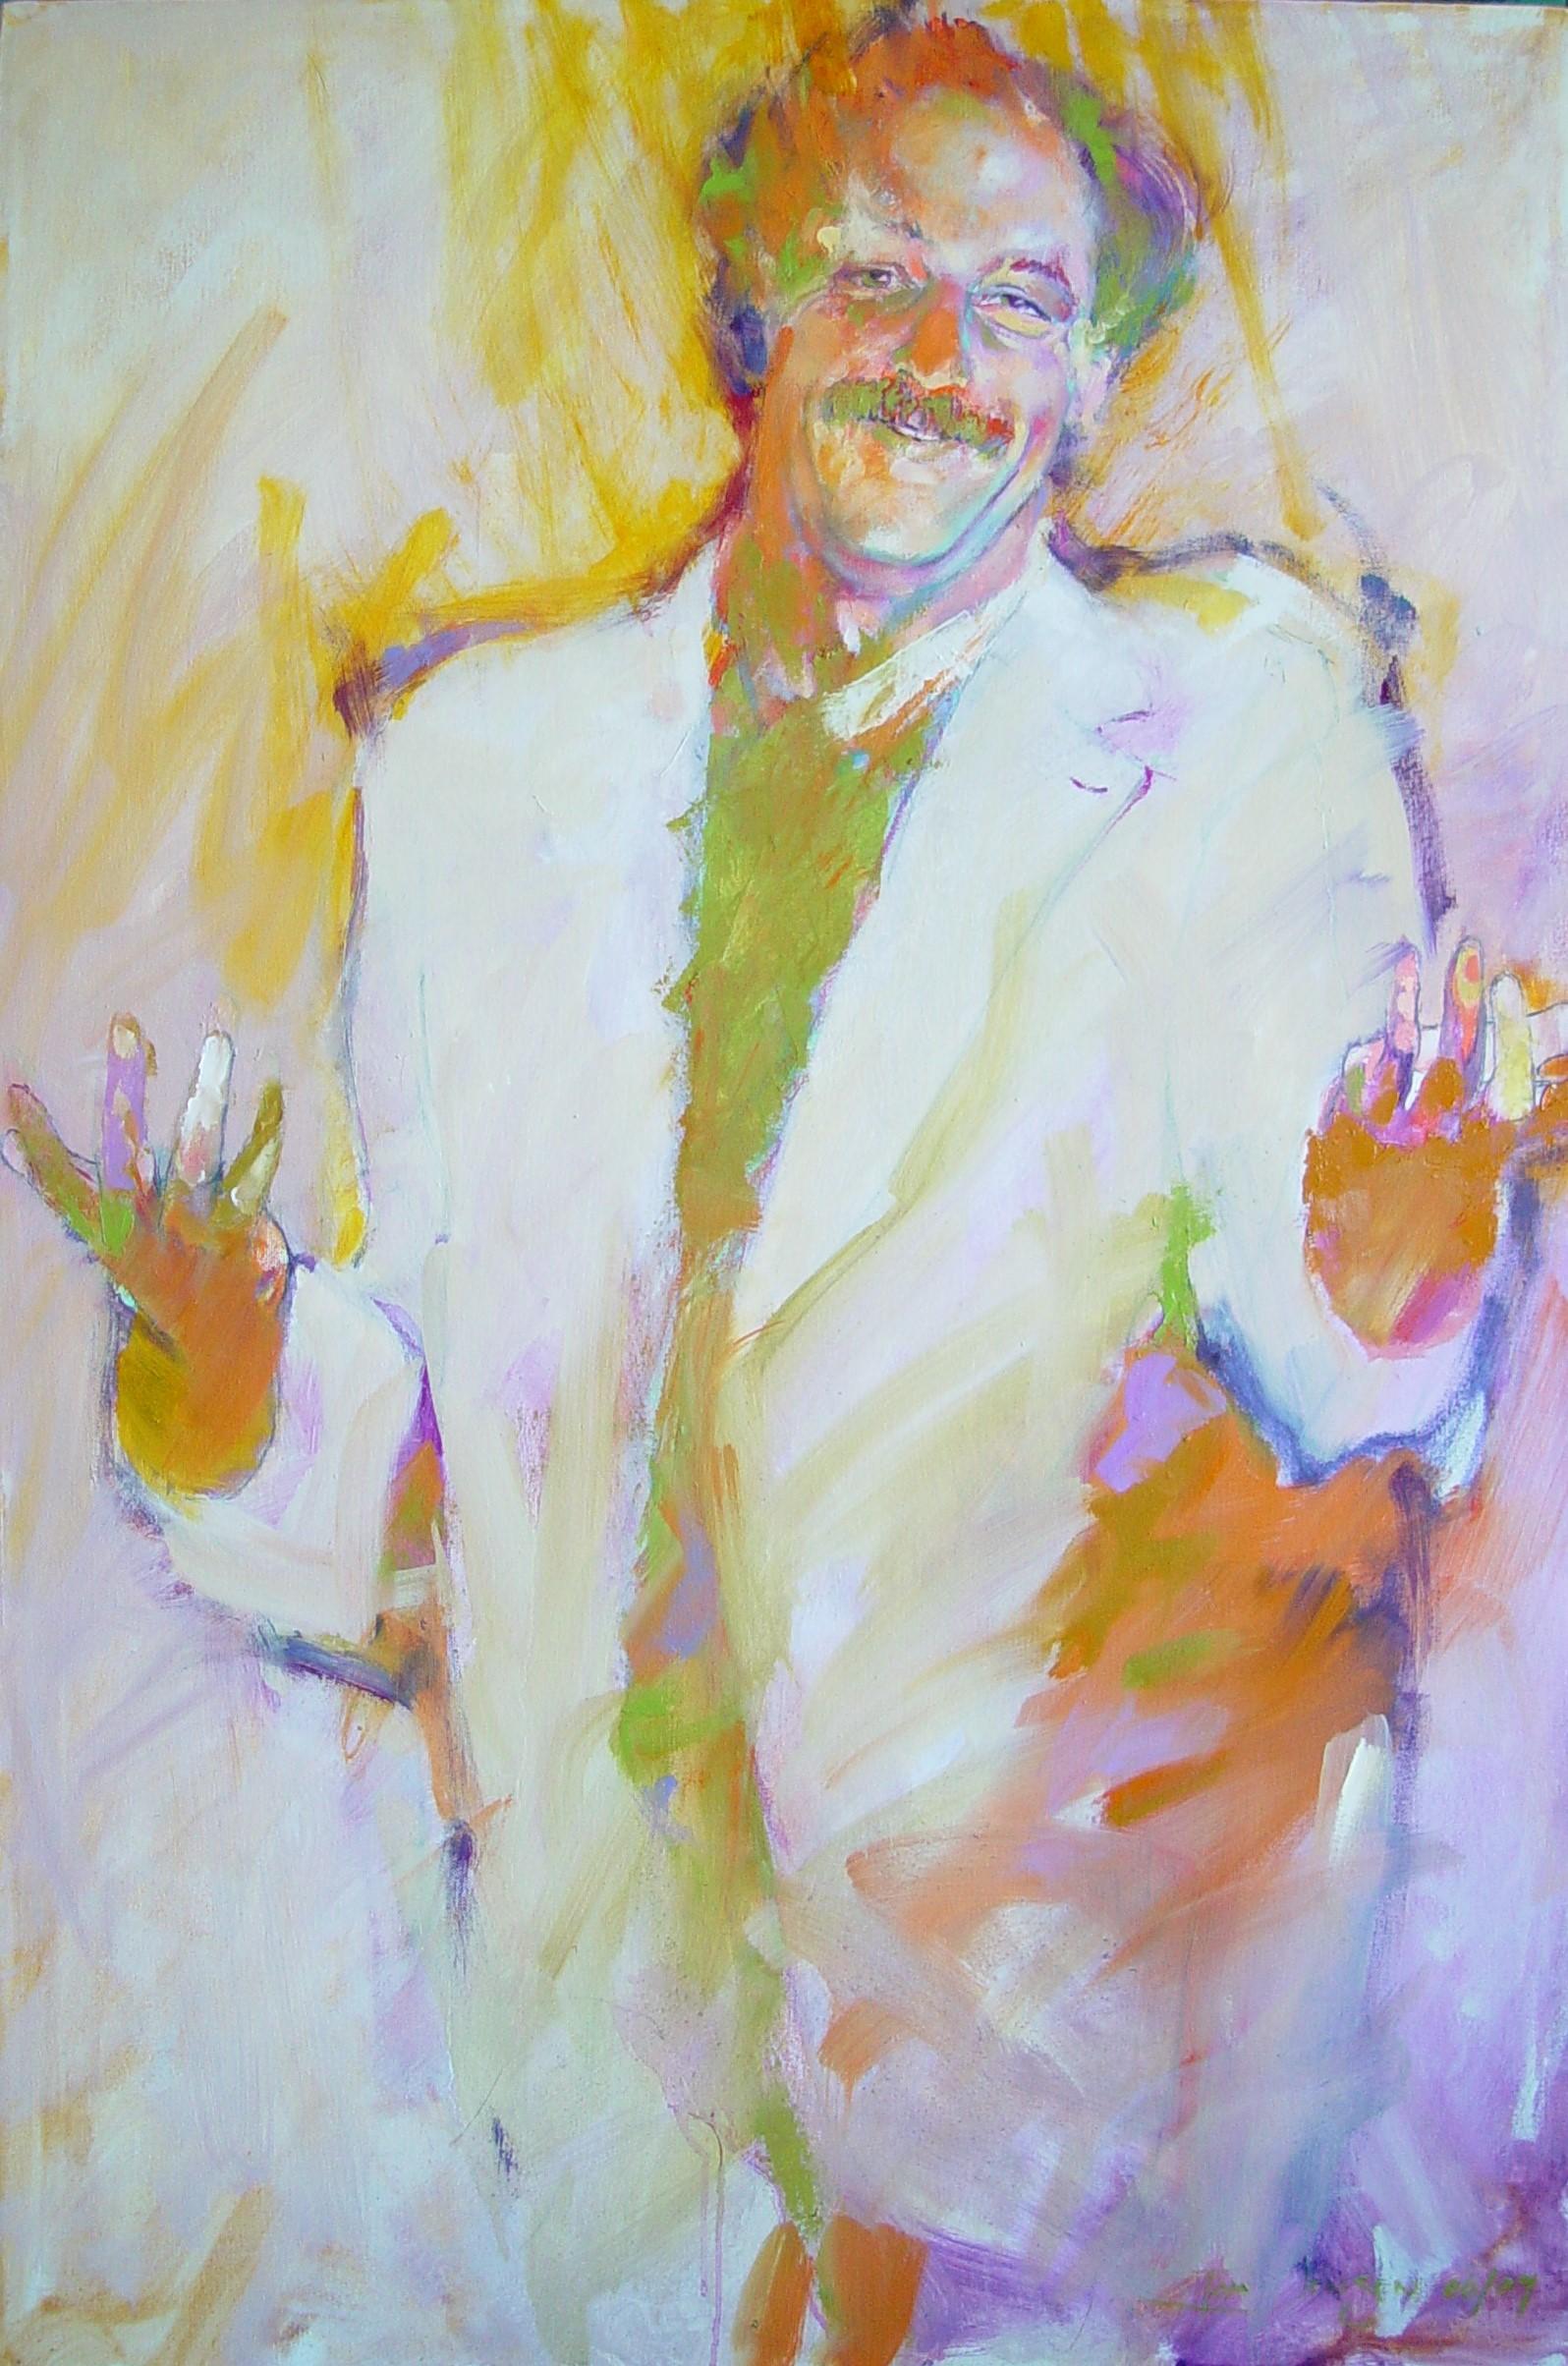 Paint 3. Larry Smith #3_Oil on Canvas_ 2006_36x24.JPG